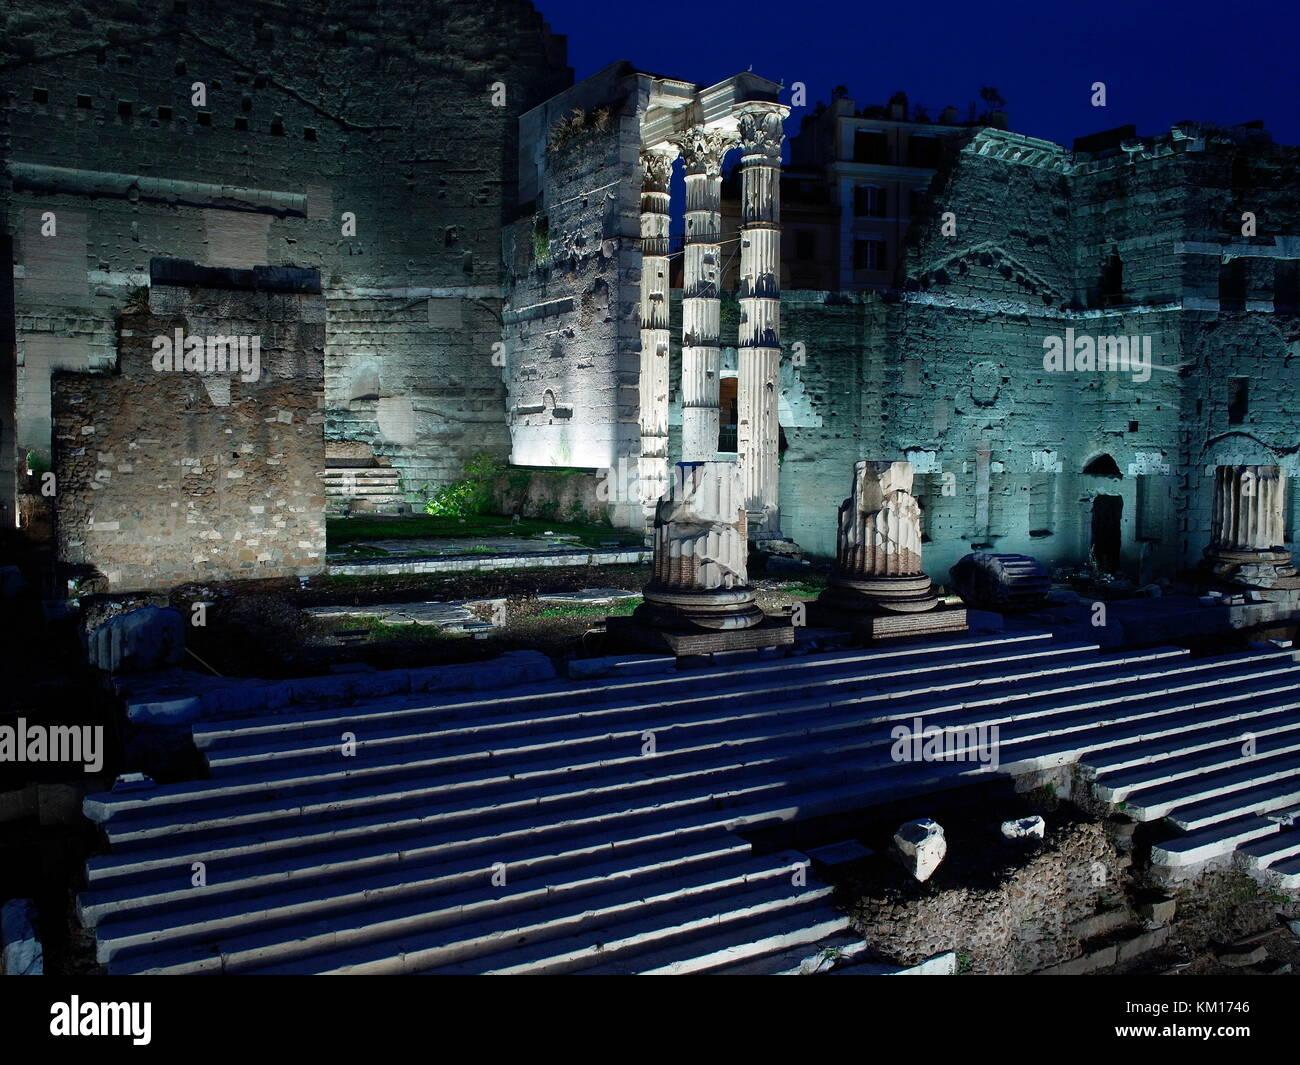 AJAXNETPHOTO. 2015. ROME, ITALY. - ROMAN RUINS - FORUM OF AUGUSTUS, COMMEMORATES BATTLE AT PHILIPPI, LOCATED NEAR THE PIAZZO FORO DEL TRAIANO.  PHOTO:JONATHAN EASTLAND/AJAX REF:GXR151012_5855 Stock Photo